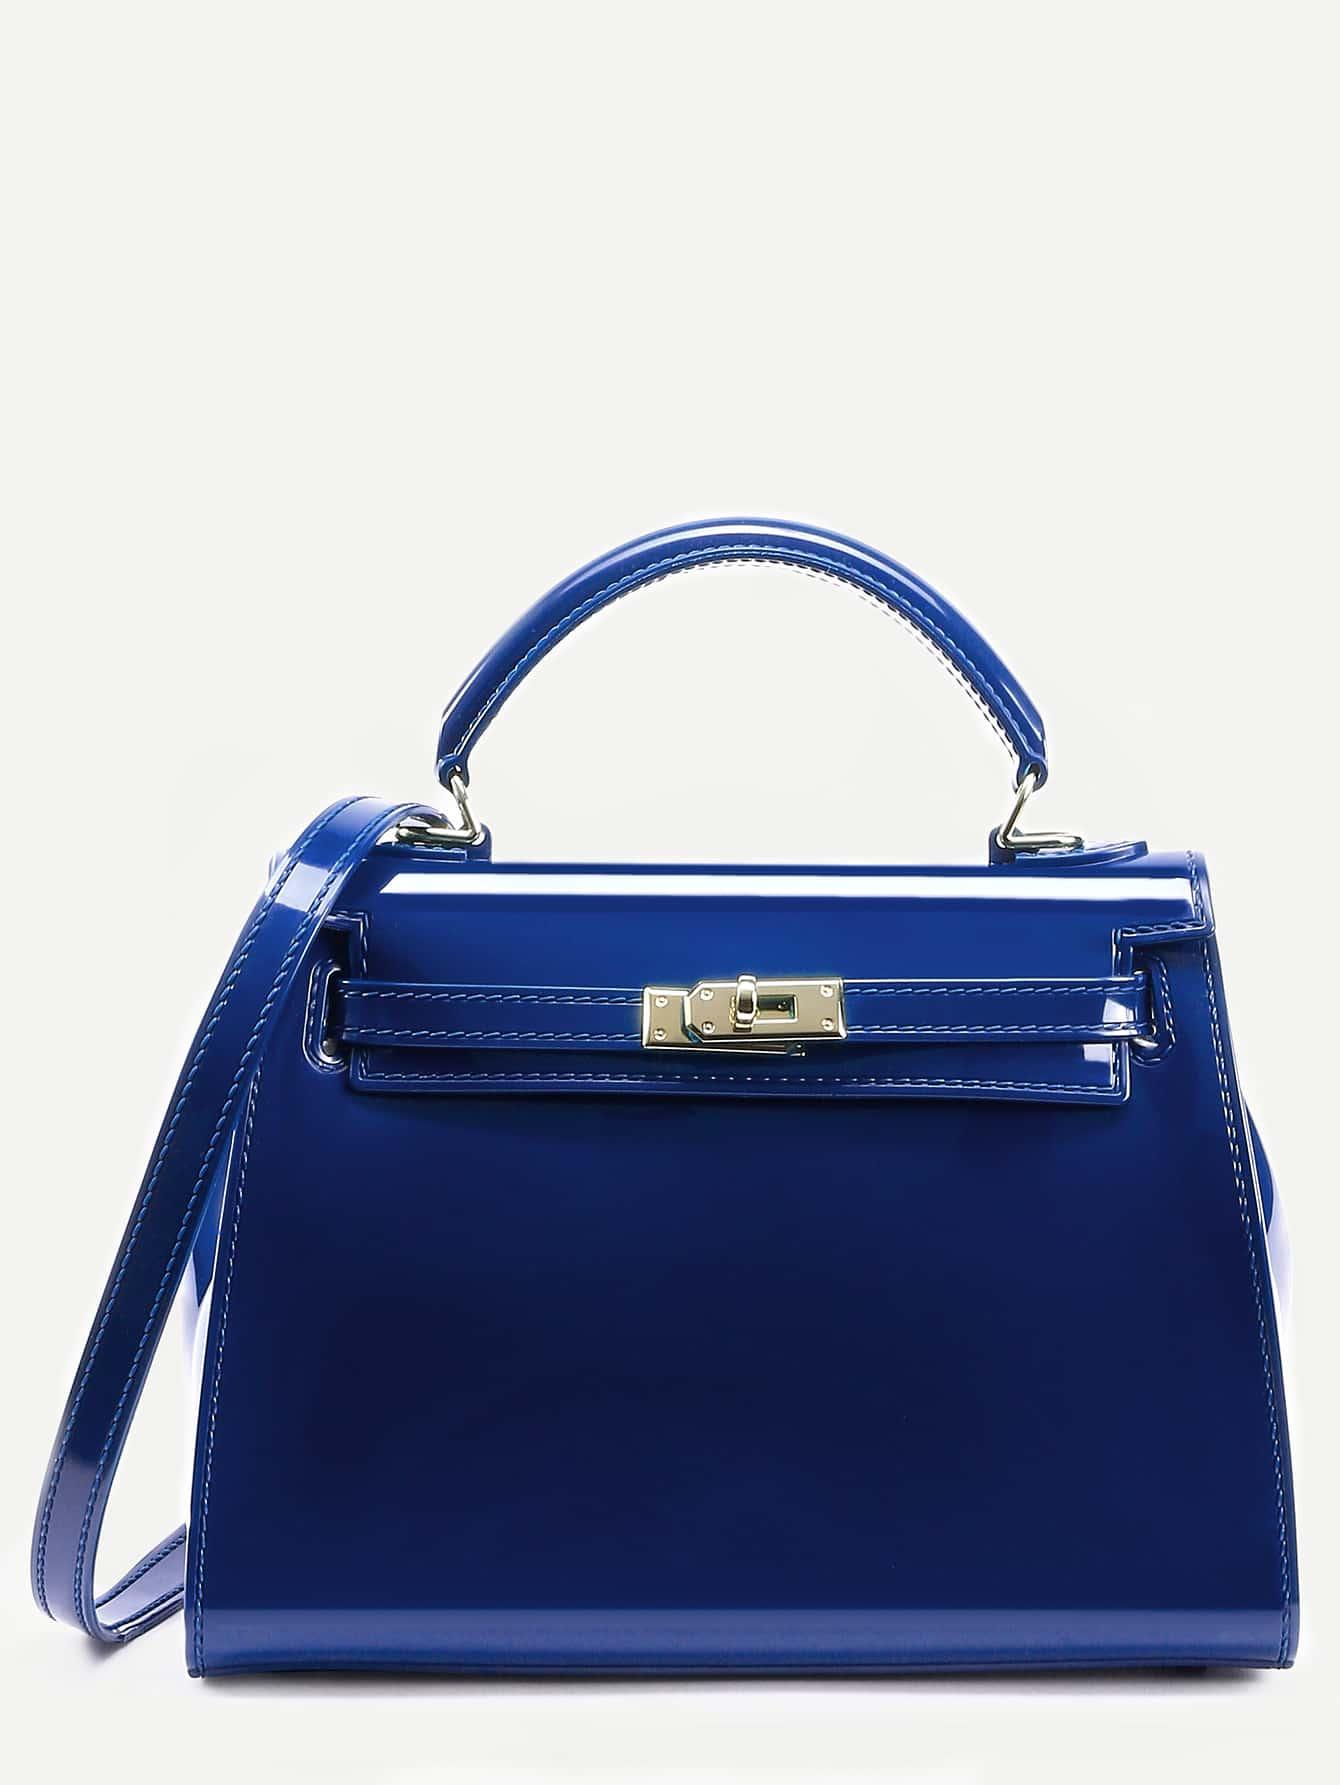 sac main en plastique avec verrou tournant bleu french shein sheinside. Black Bedroom Furniture Sets. Home Design Ideas